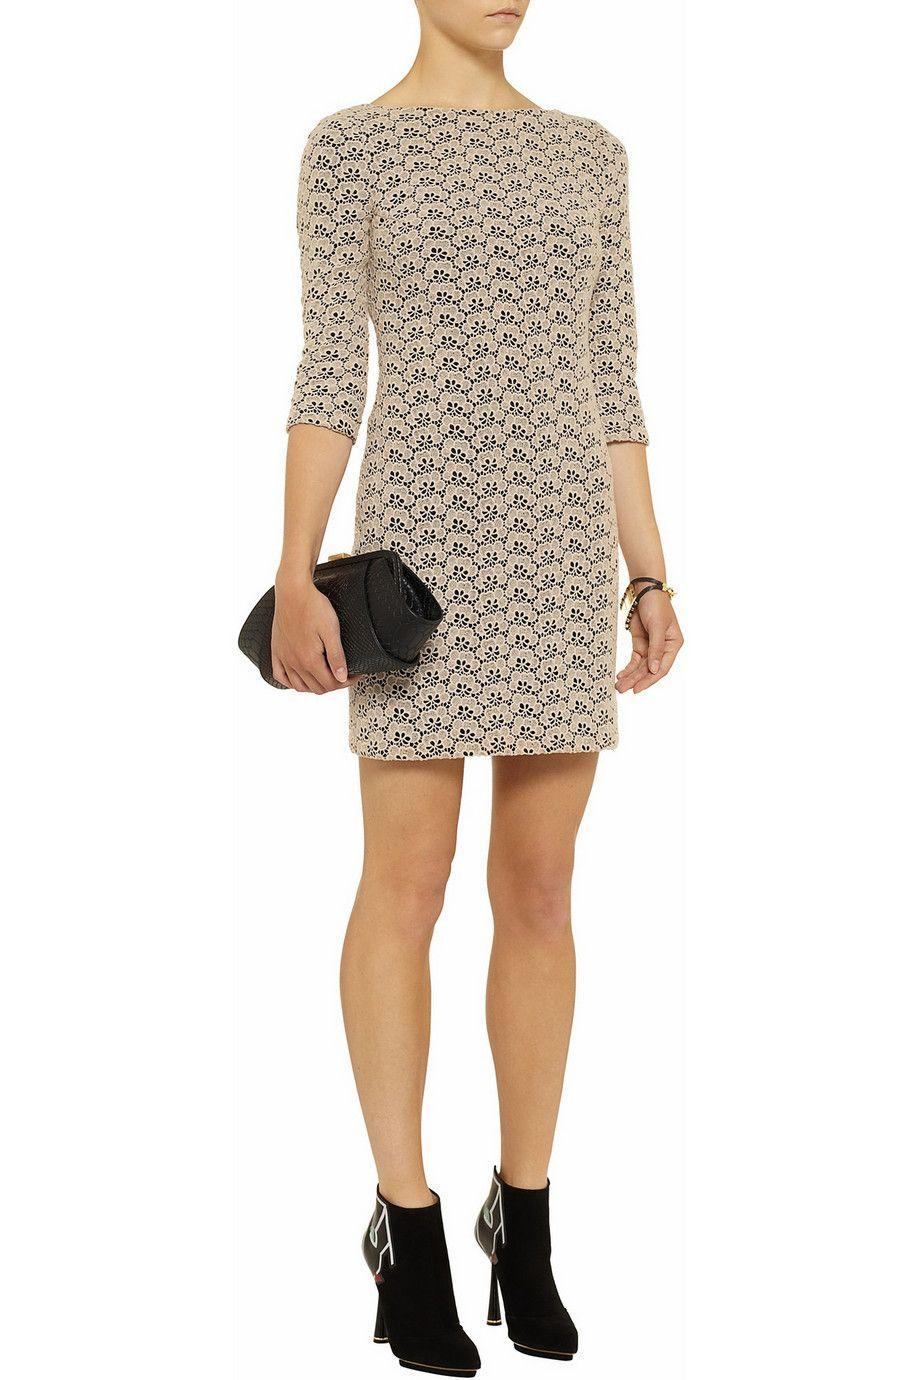 Diane von Furstenberg Sarita lace dress - 50% Off Now at THE OUTNET ...